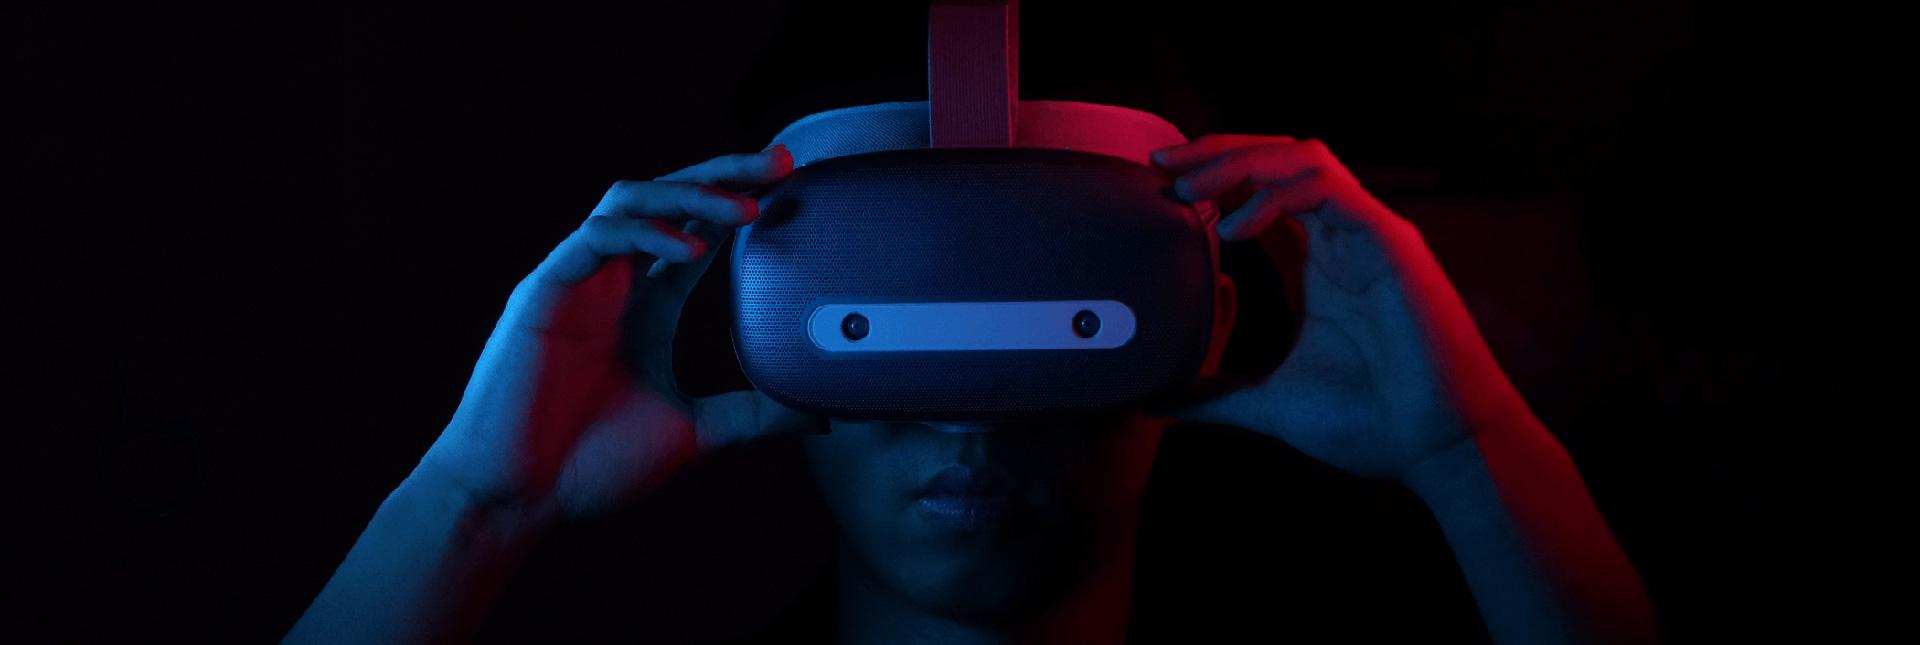 comment nettoyer casque realite virtuelle vr formation